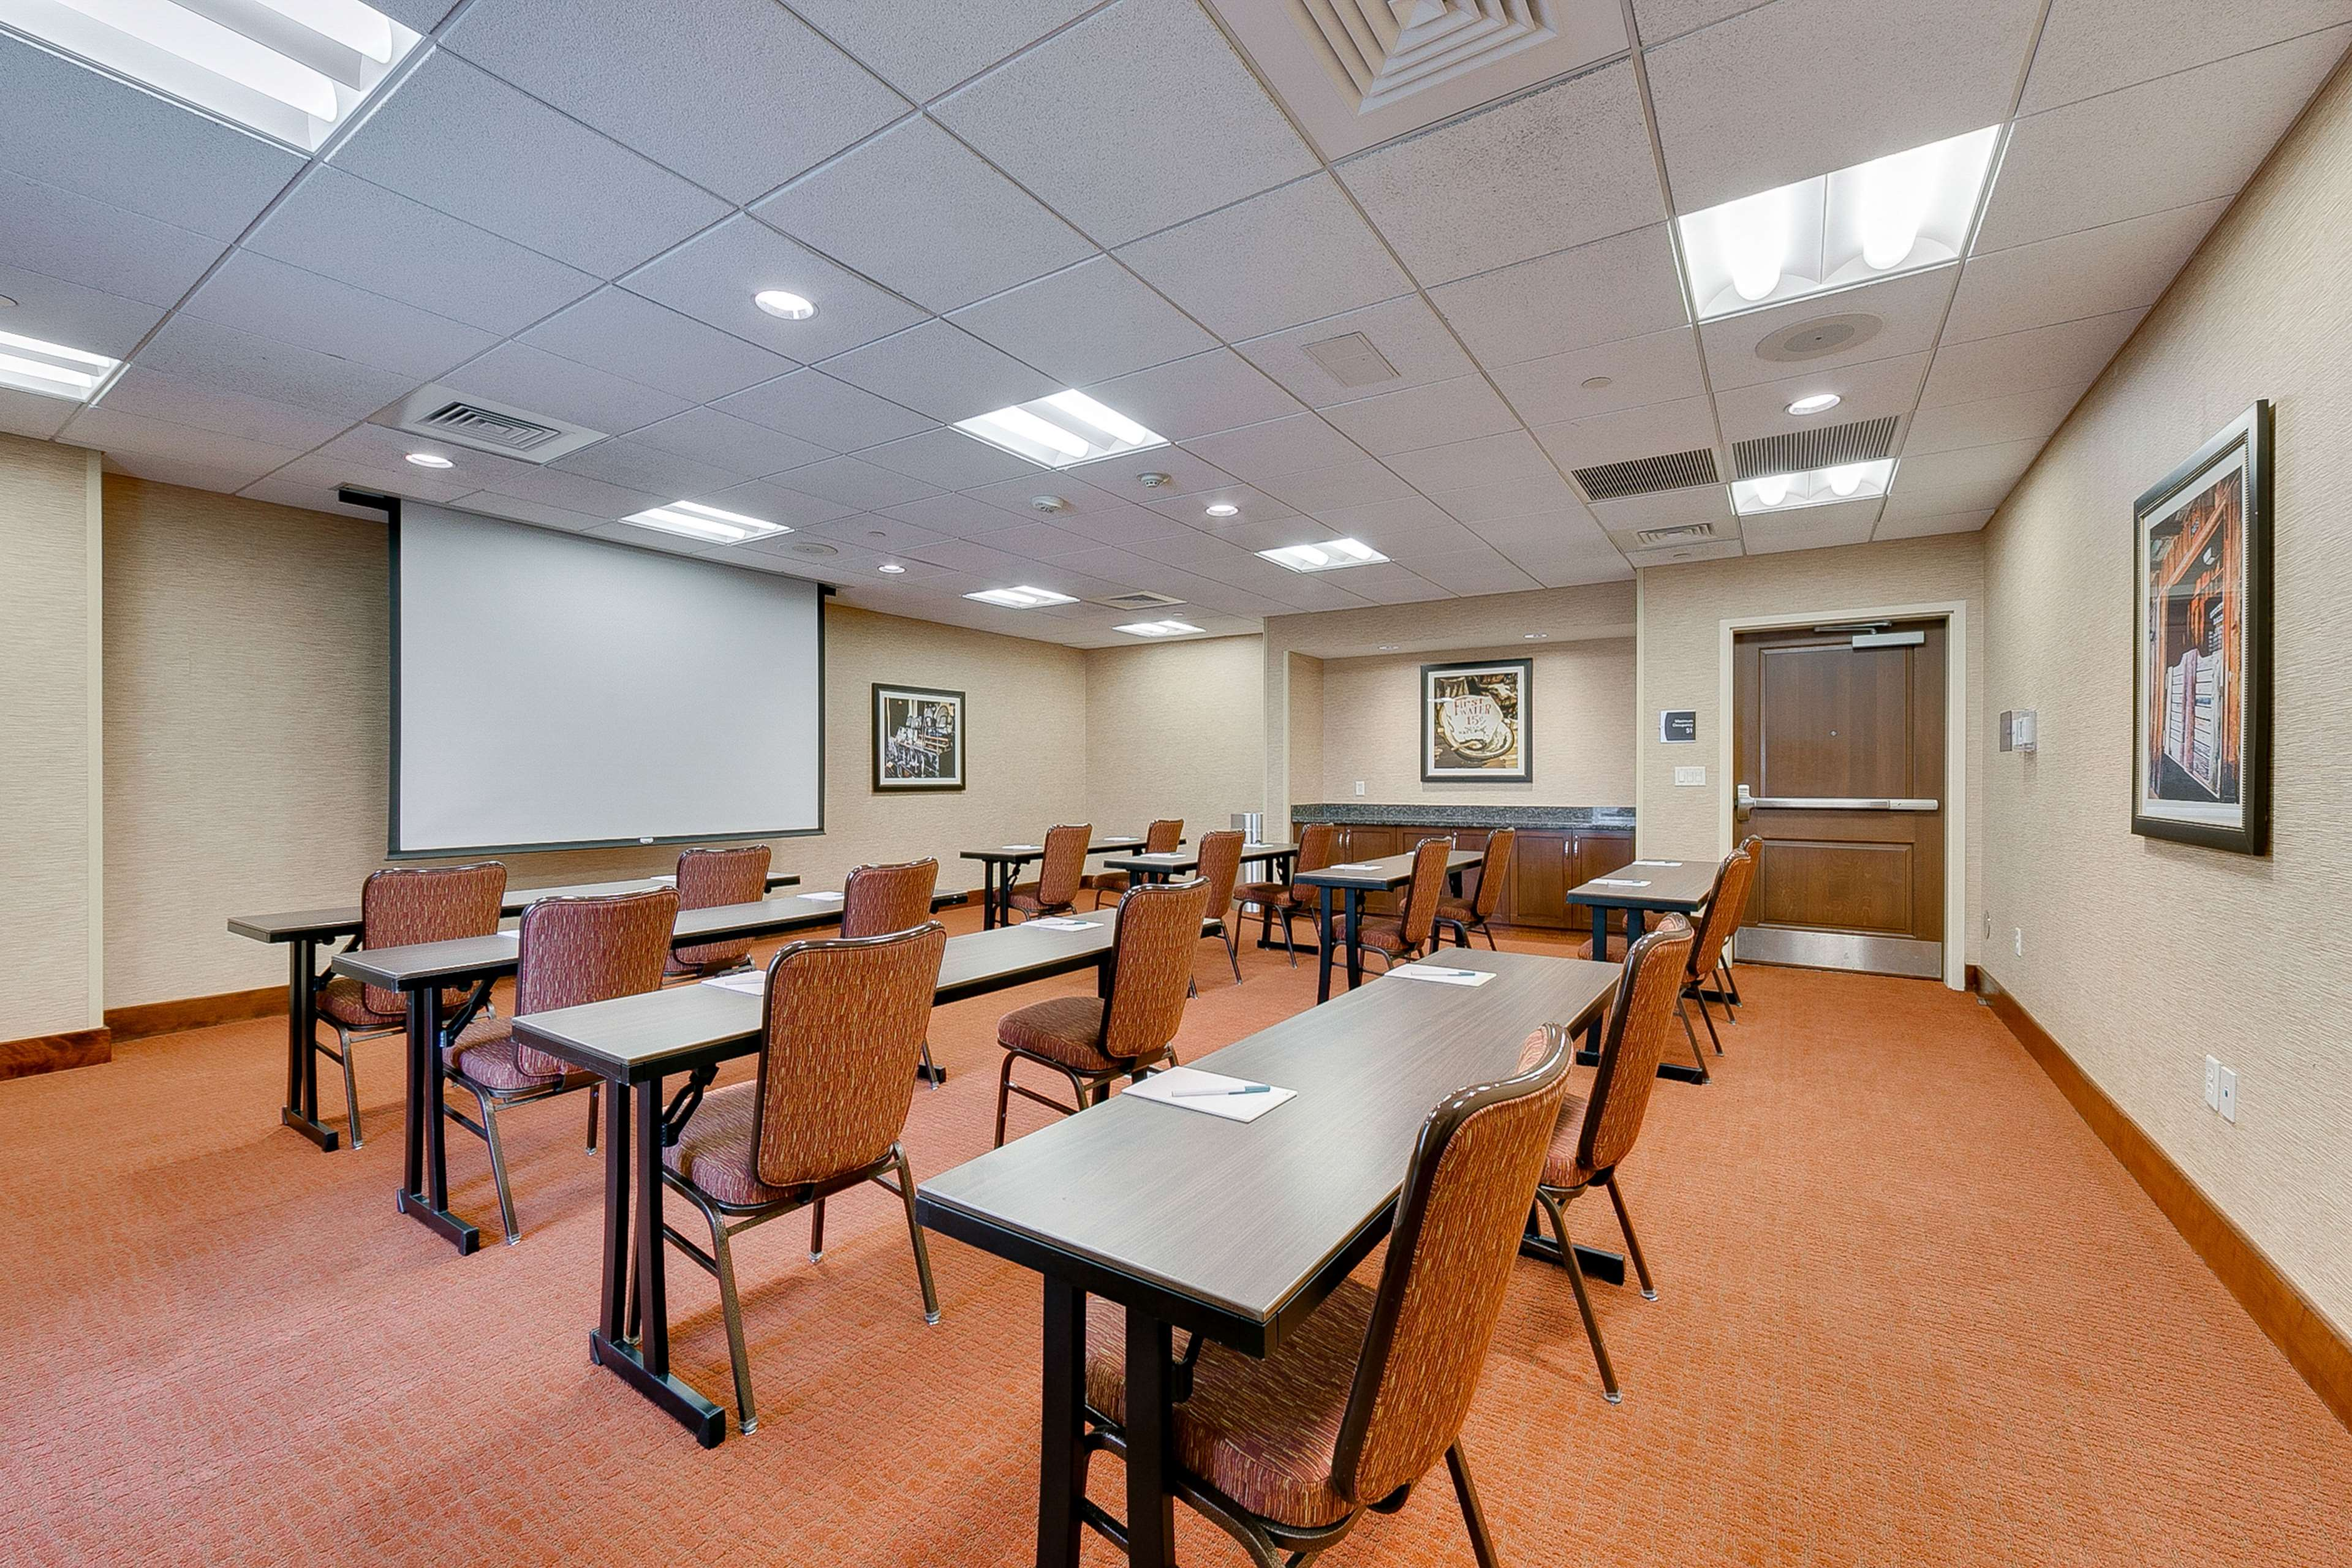 Homewood Suites by Hilton Fort Worth - Medical Center, TX image 24